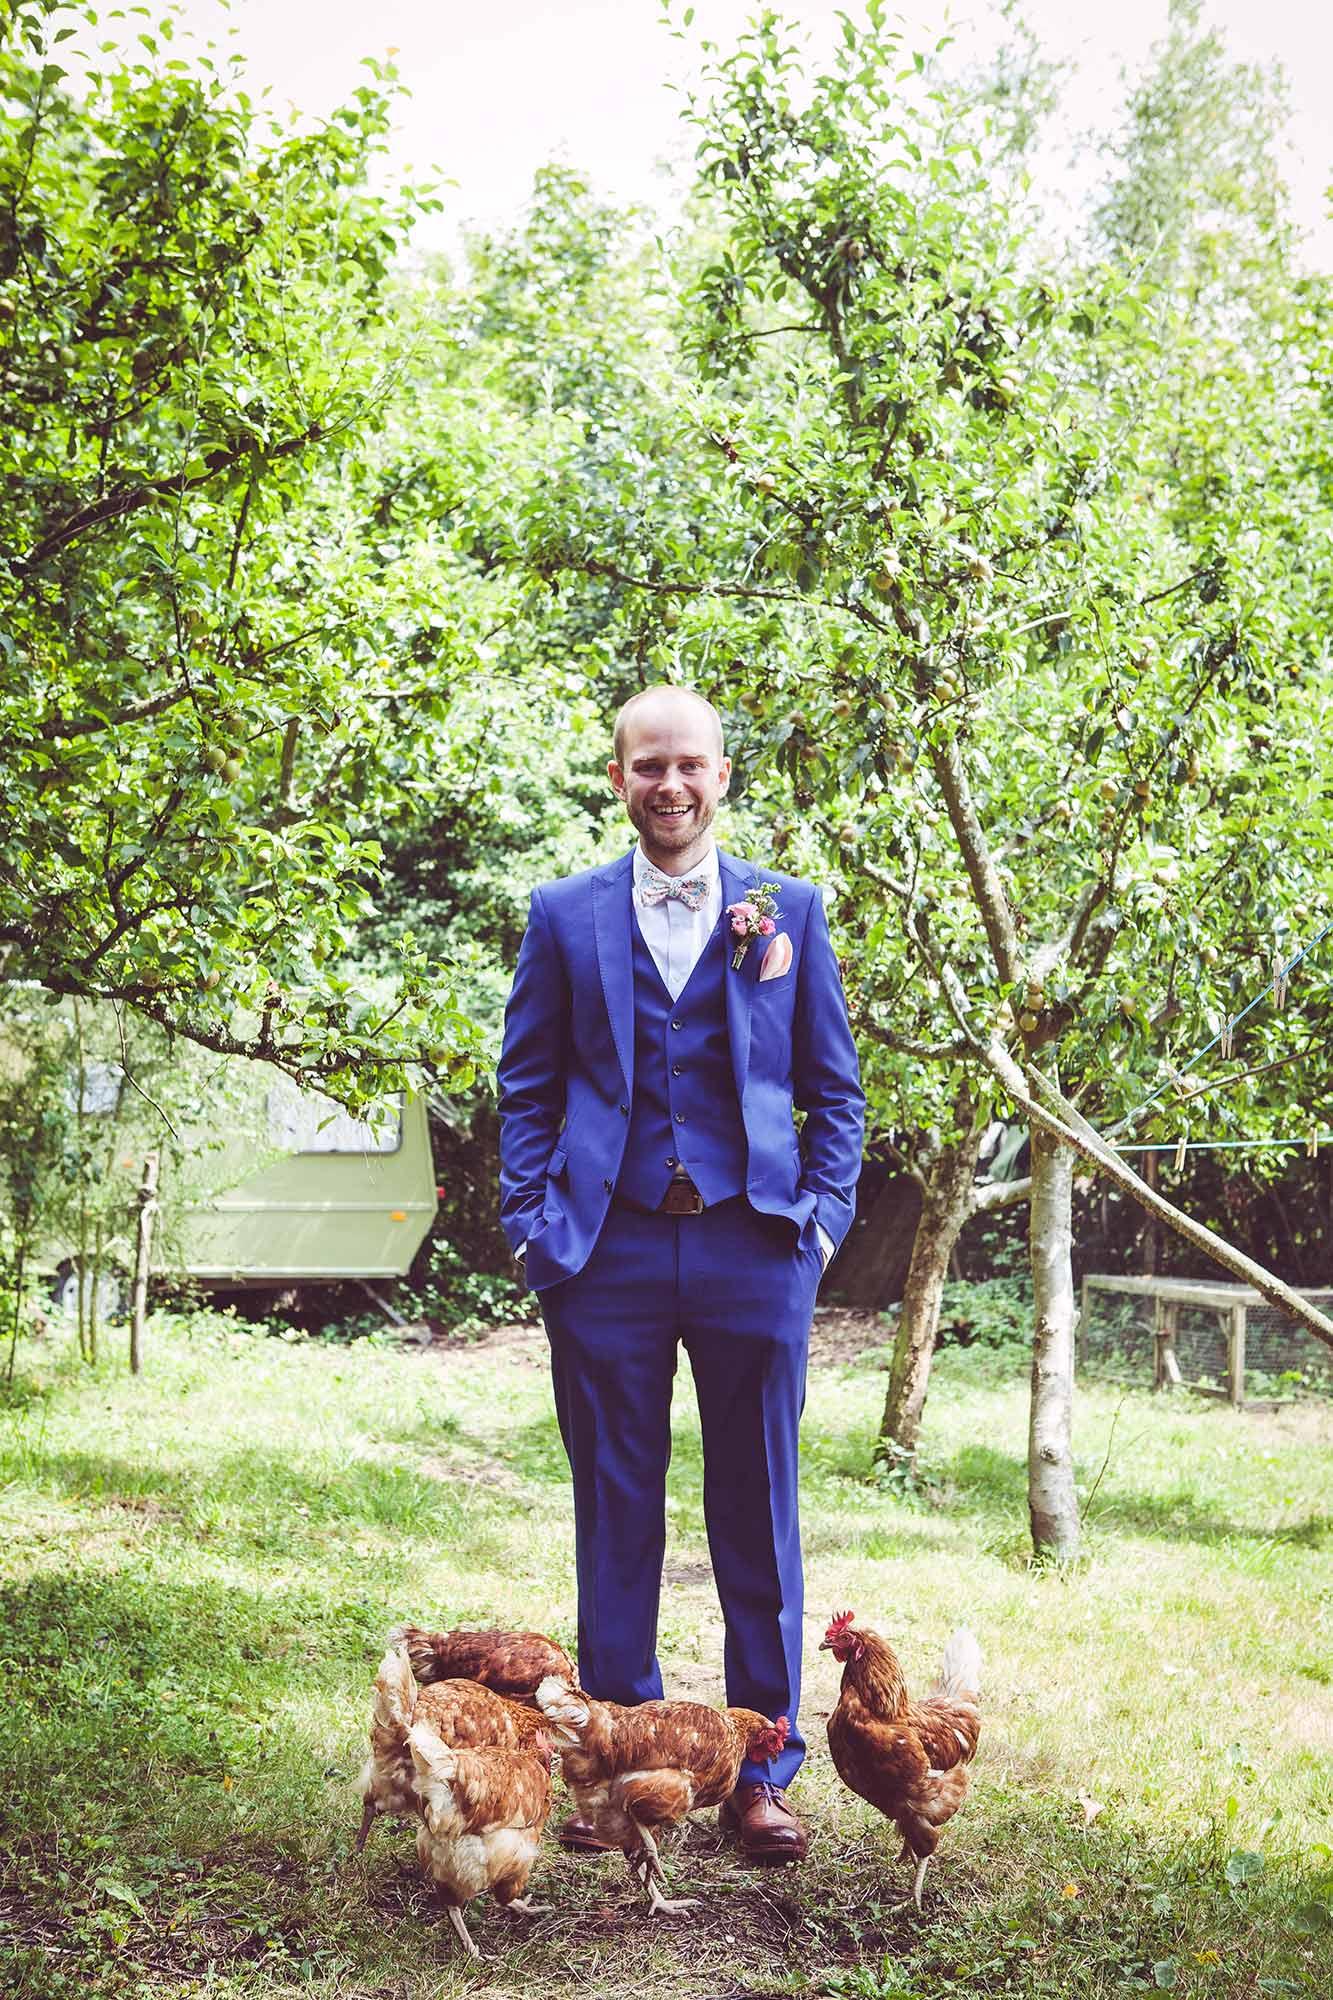 Portrait of Alex the groom